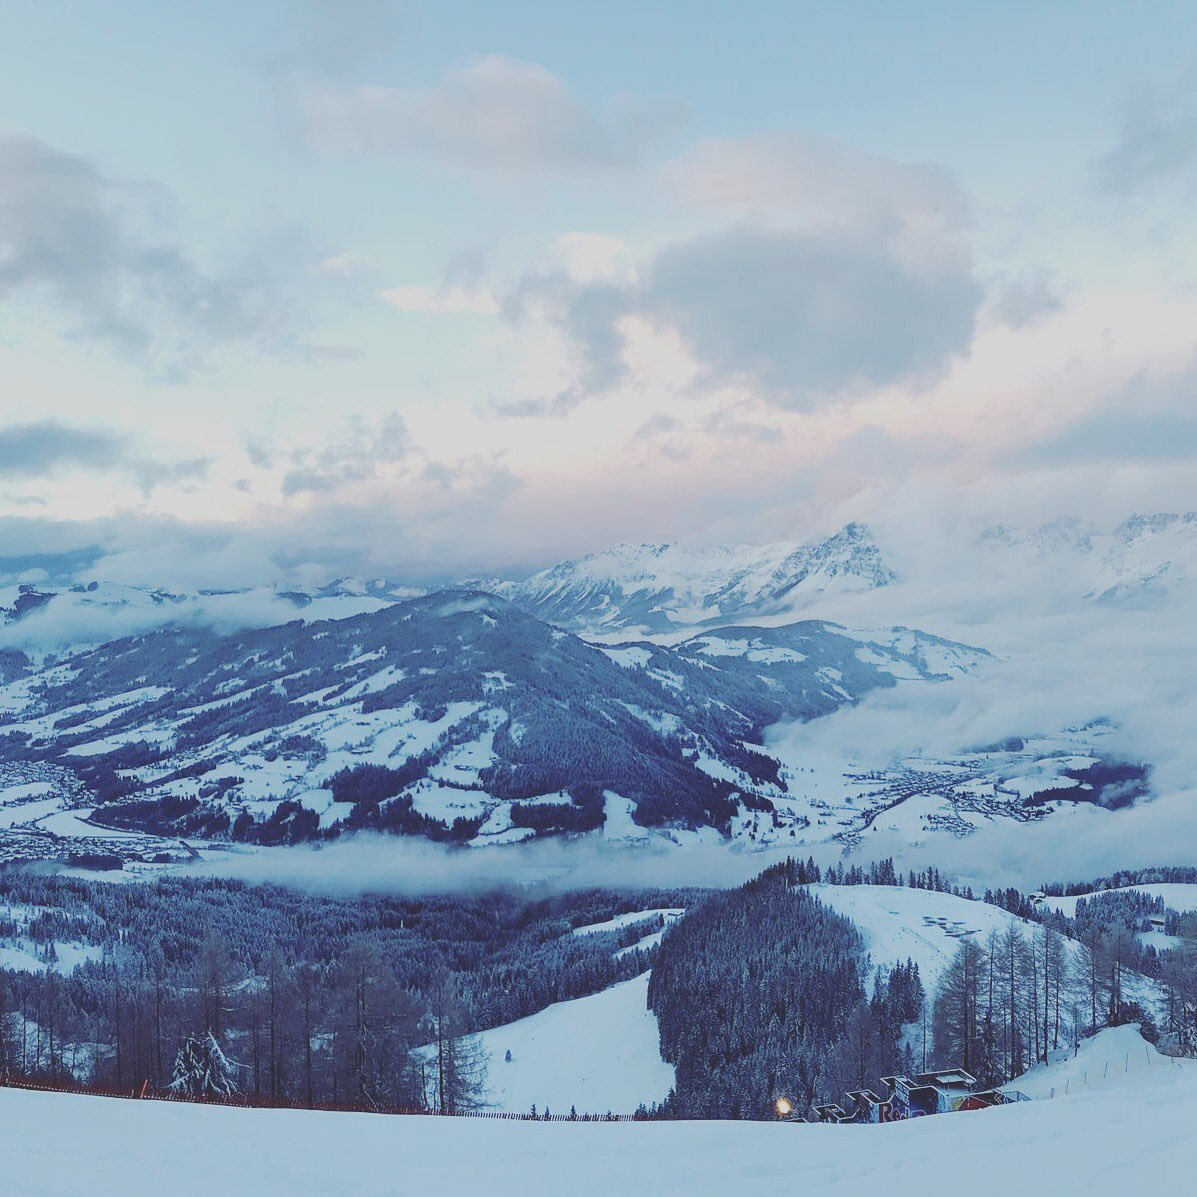 Best Time in the Mountains #kitzbühel #Kitzbuehel #Hahnenkamm #Streif �� https://t.co/1bolZfugg1